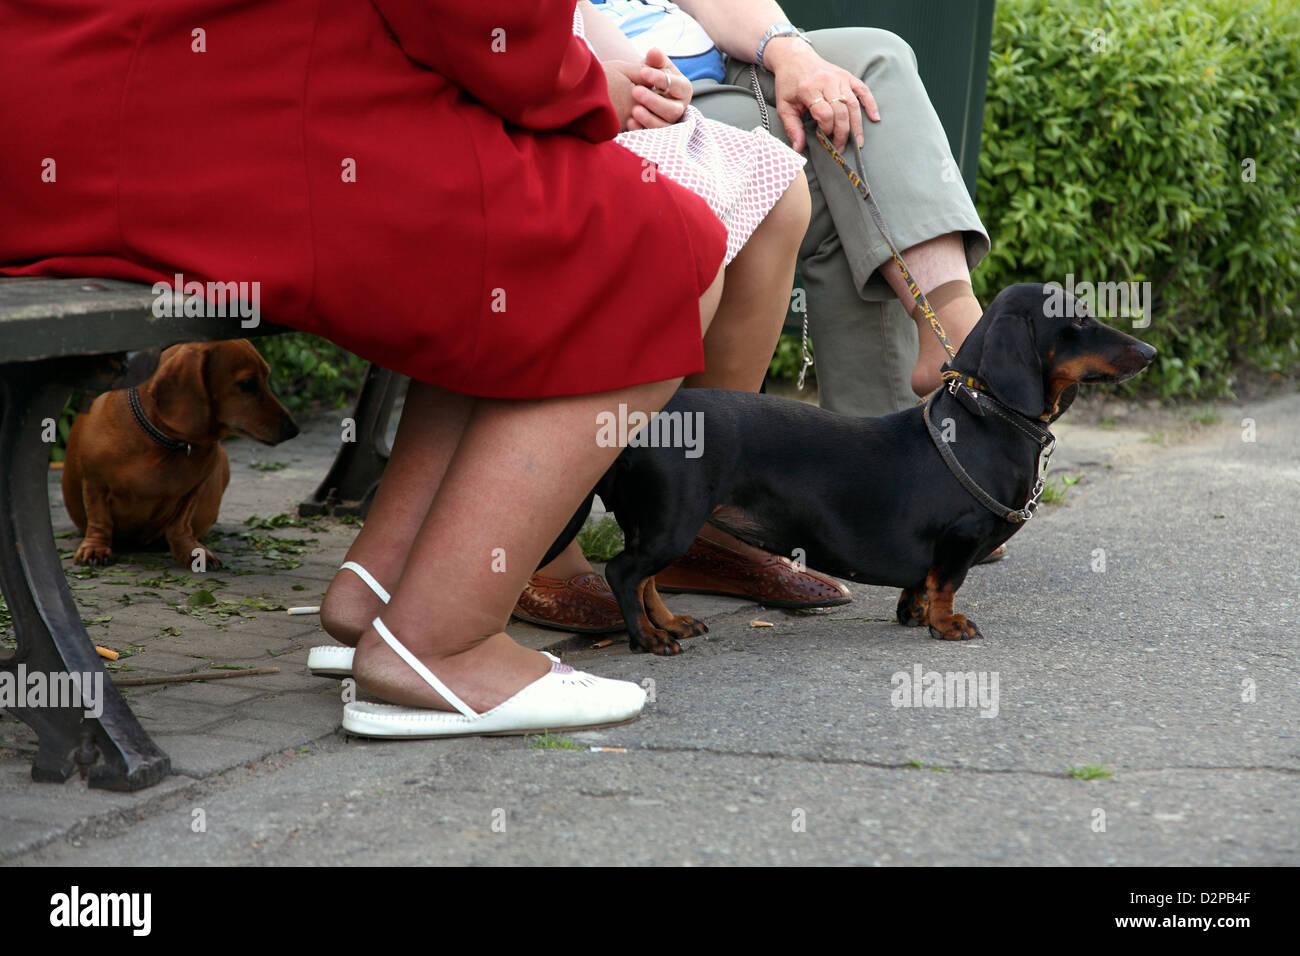 Kalisz, Poland, dachshund observe the environment - Stock Image